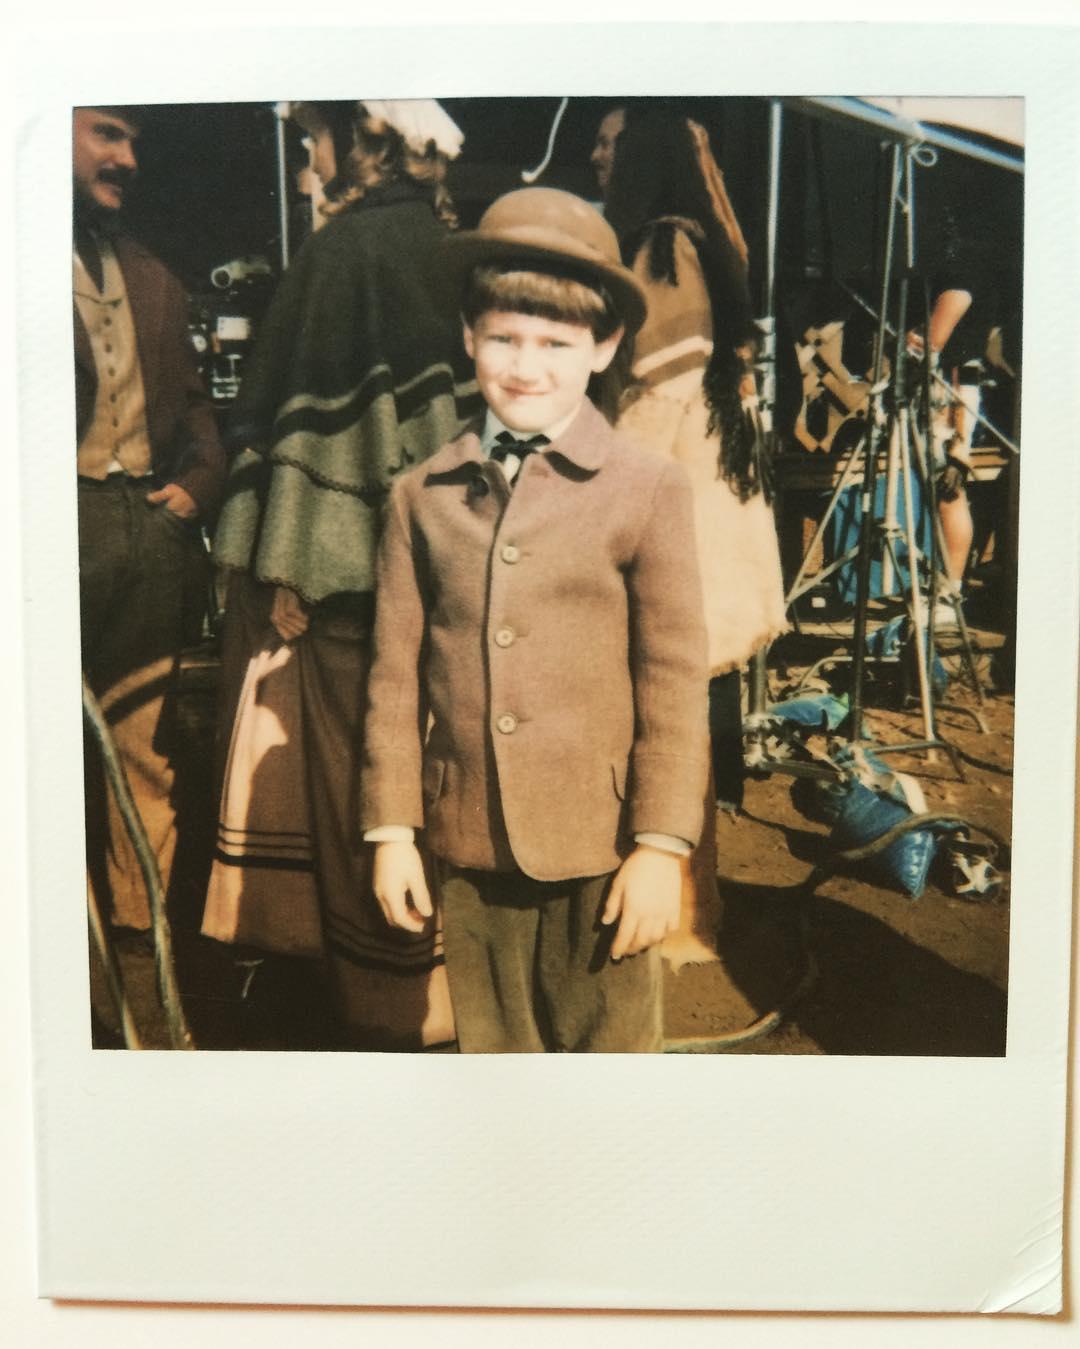 James Lafferty image of his childhood